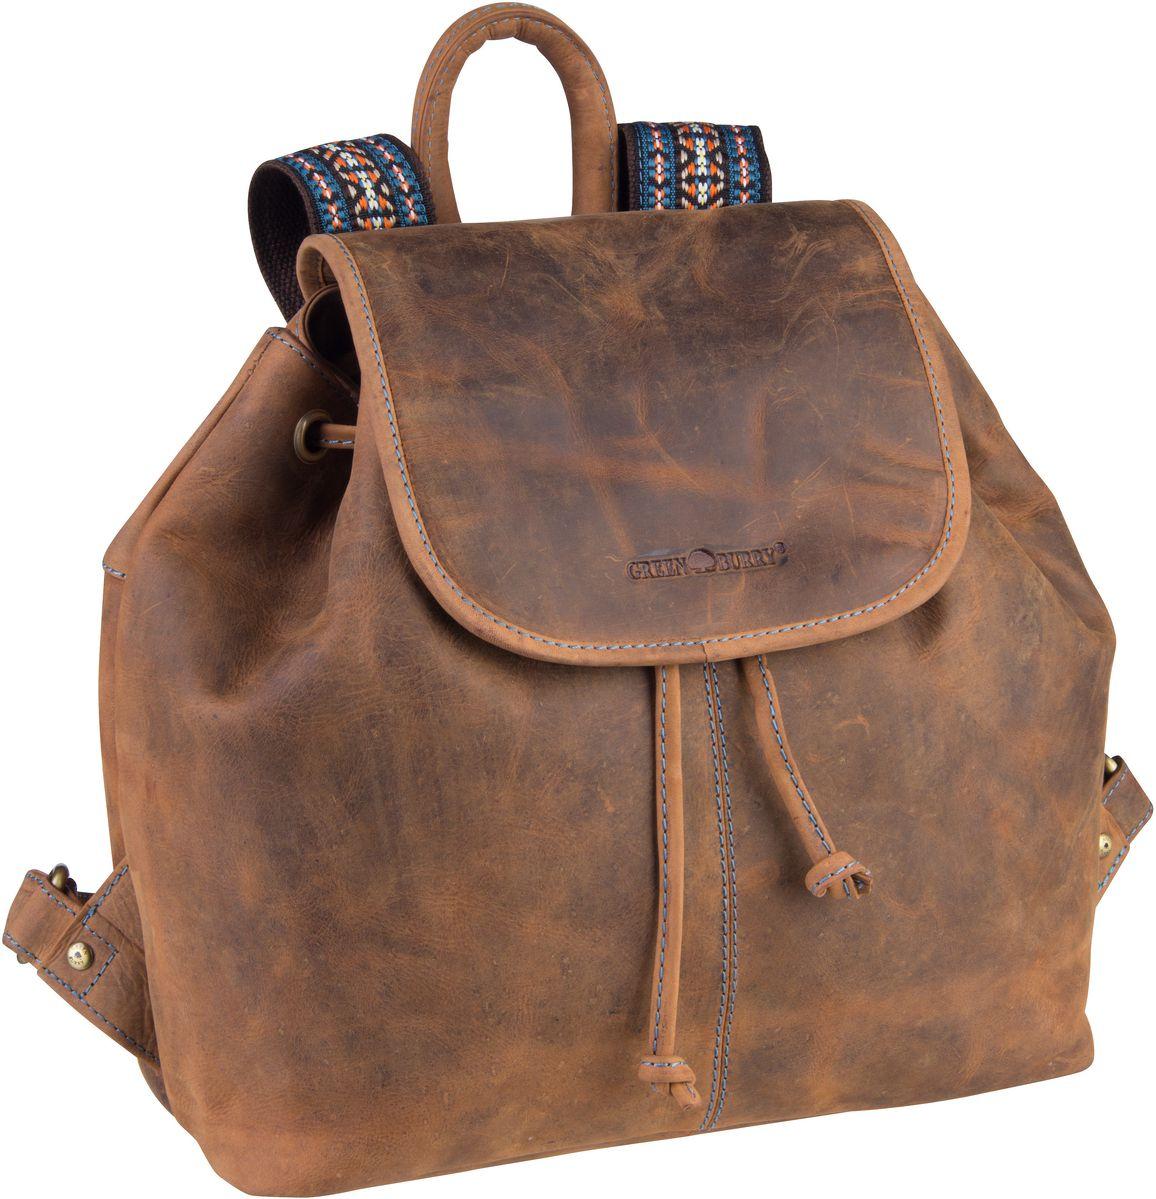 Rucksack / Daypack Vintage Santana 1617 Rucksack Sattelbraun